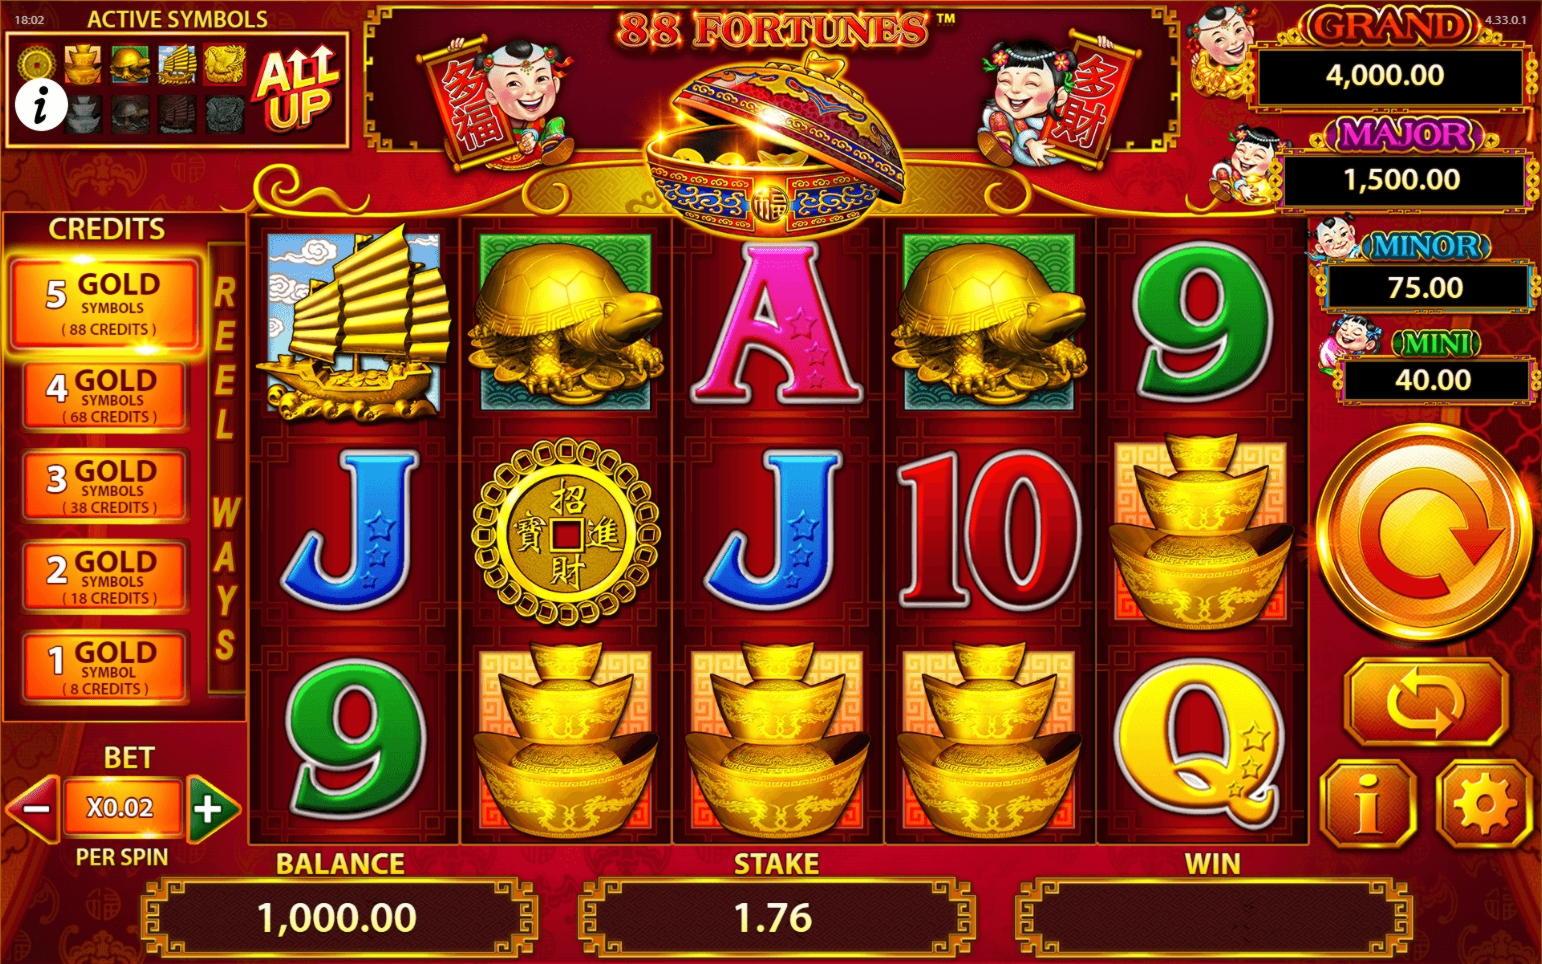 45 FREE Spins at Slots Billion Casino